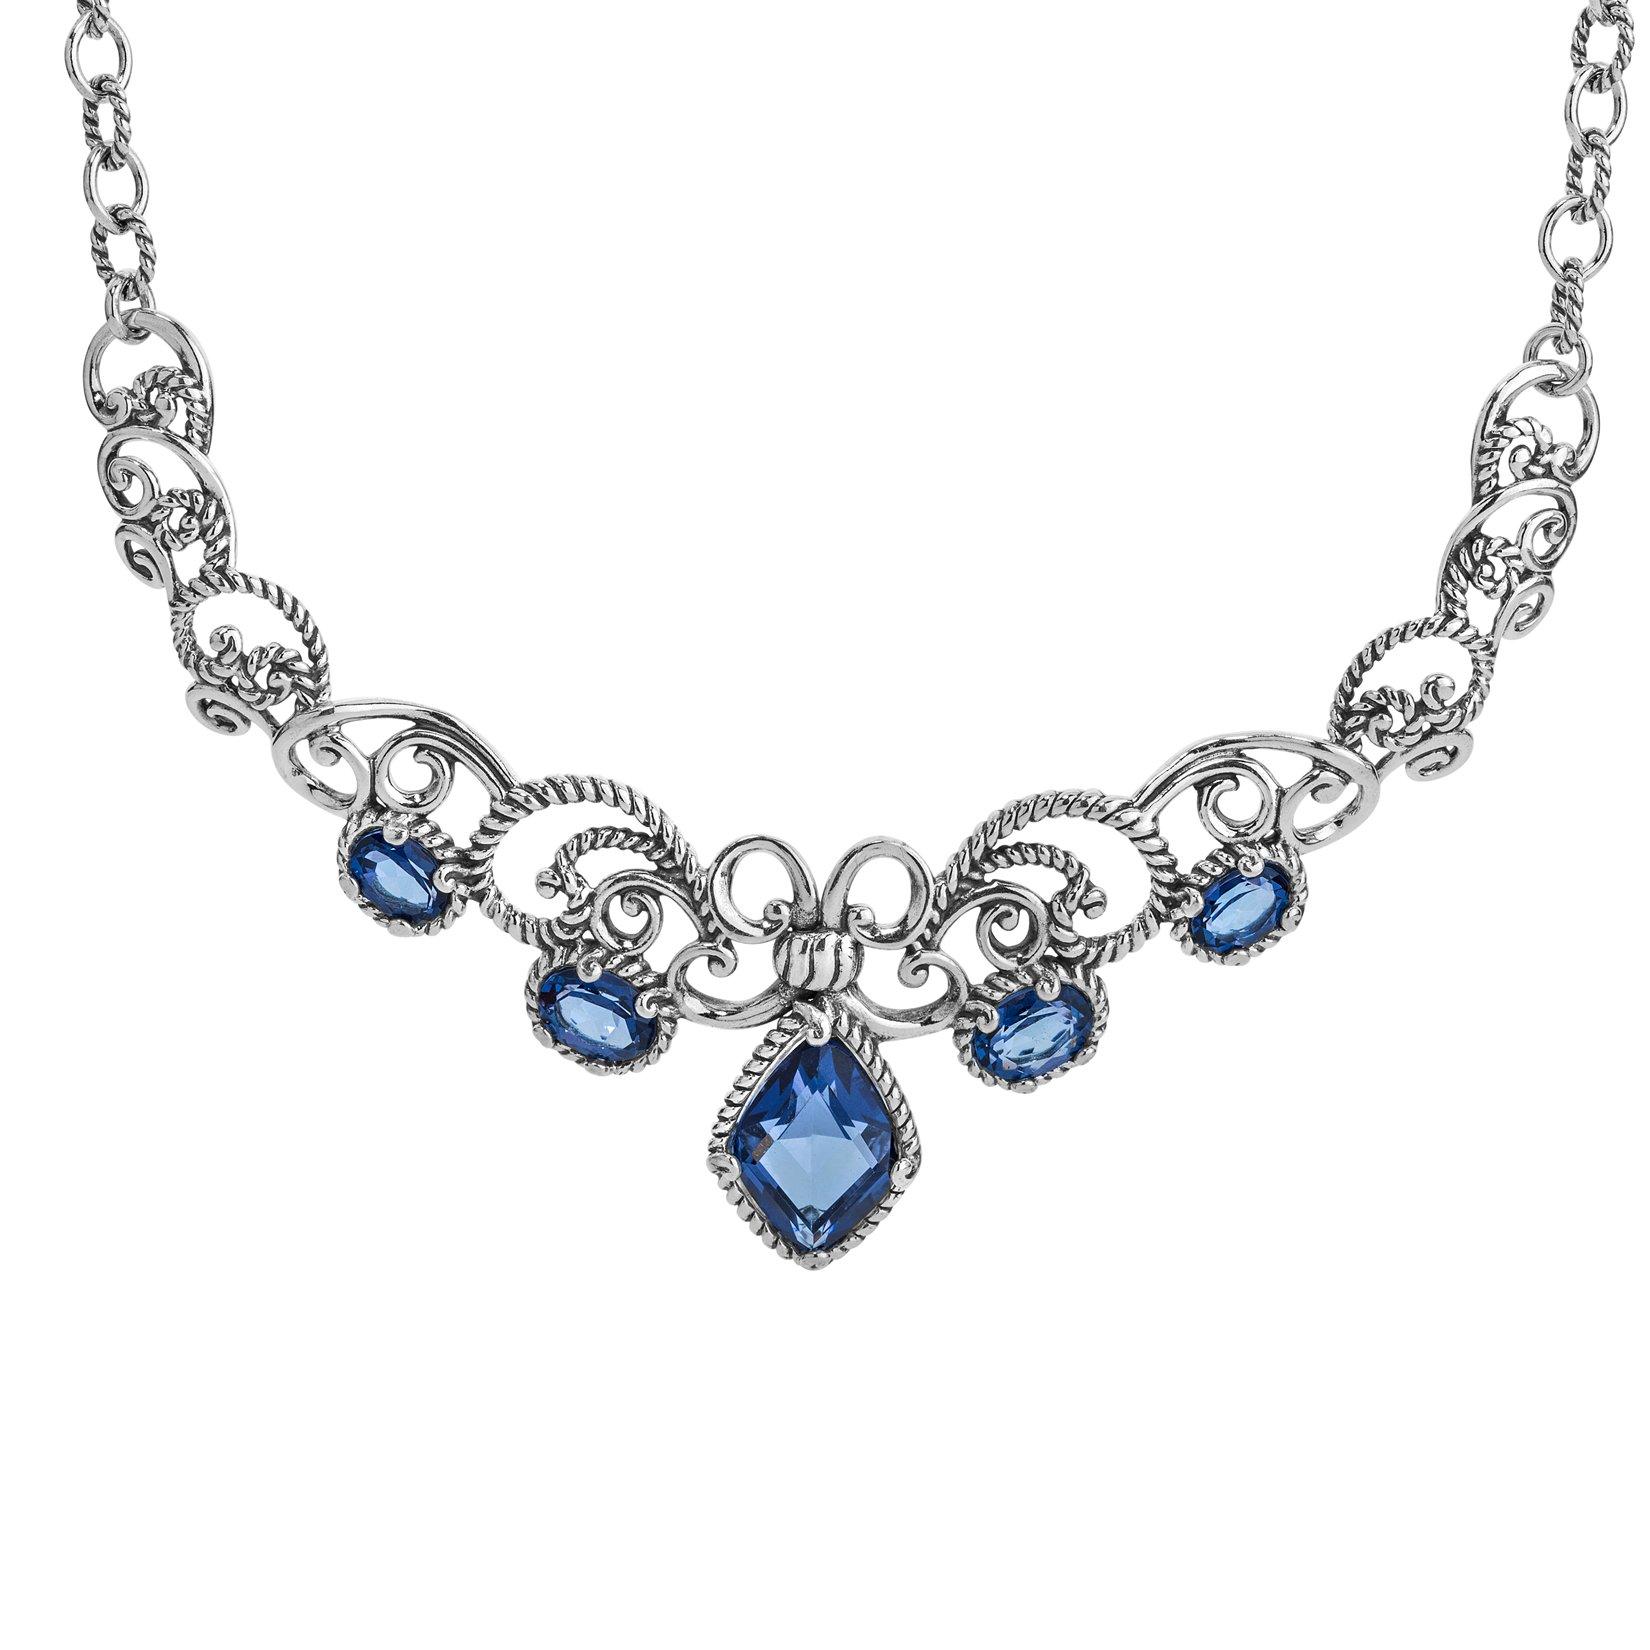 Carolyn Pollack Faceted Blue Quartz Statement Necklace